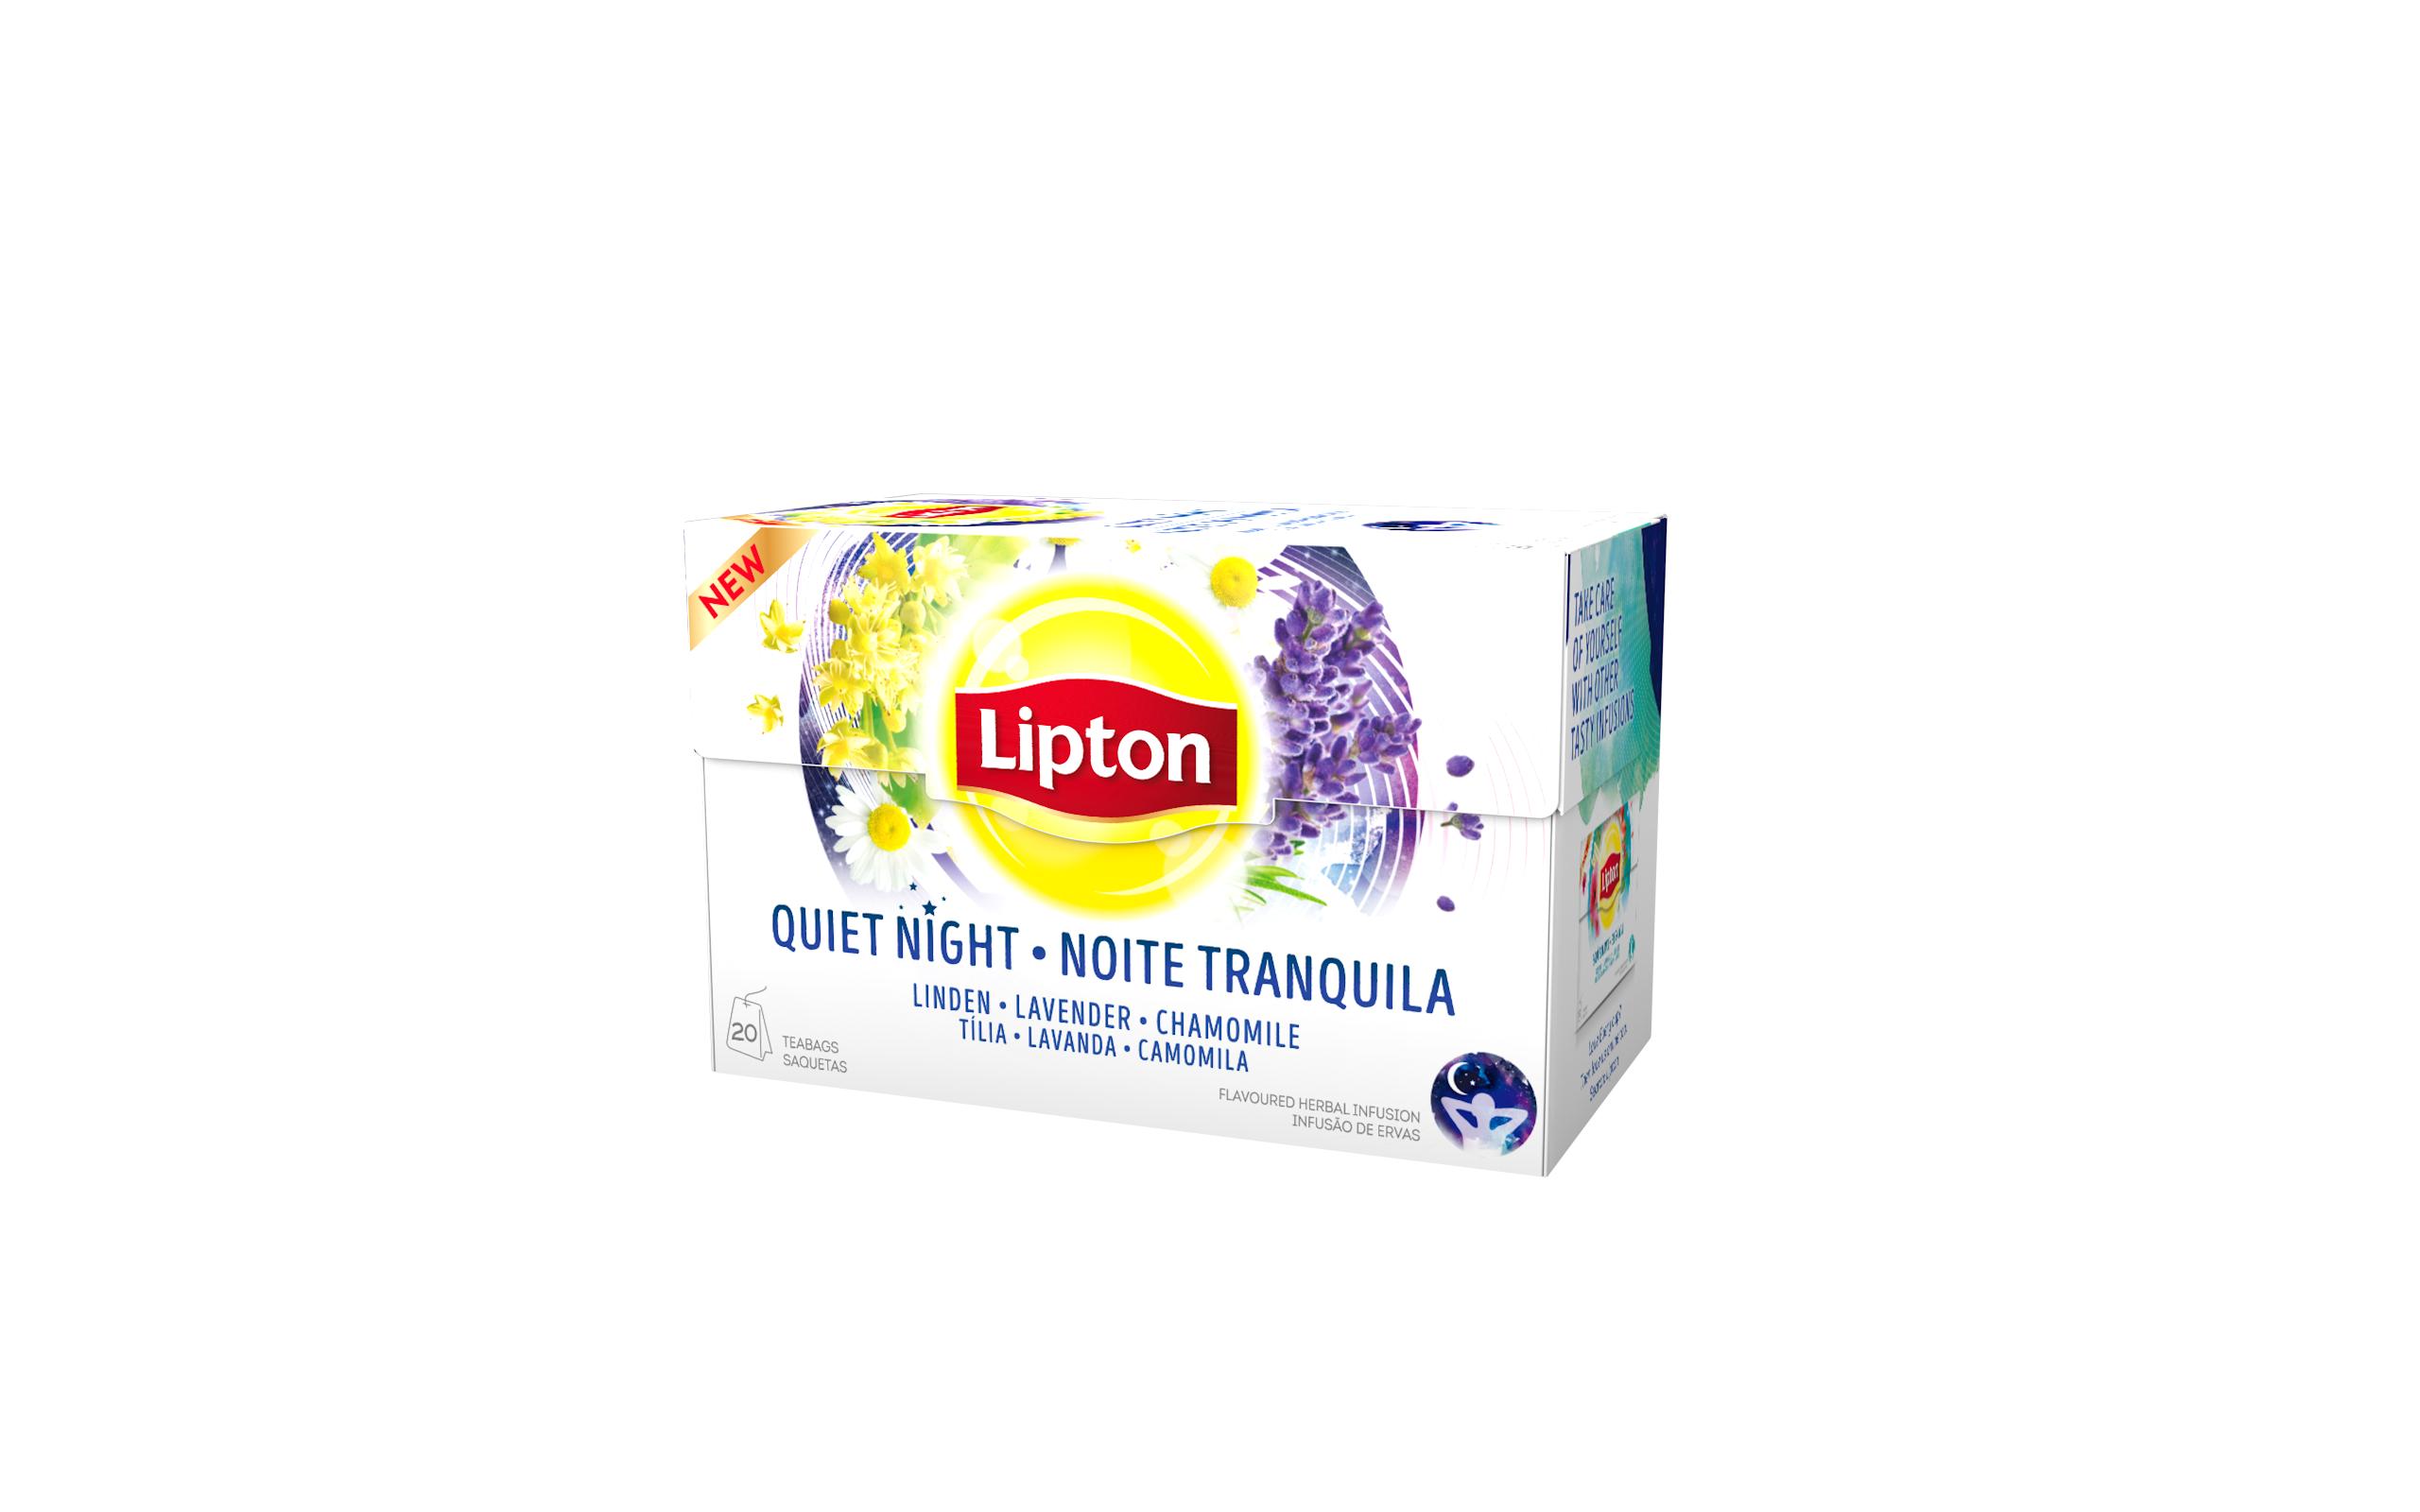 Lipton Noite Tranquila 20 Saquetas